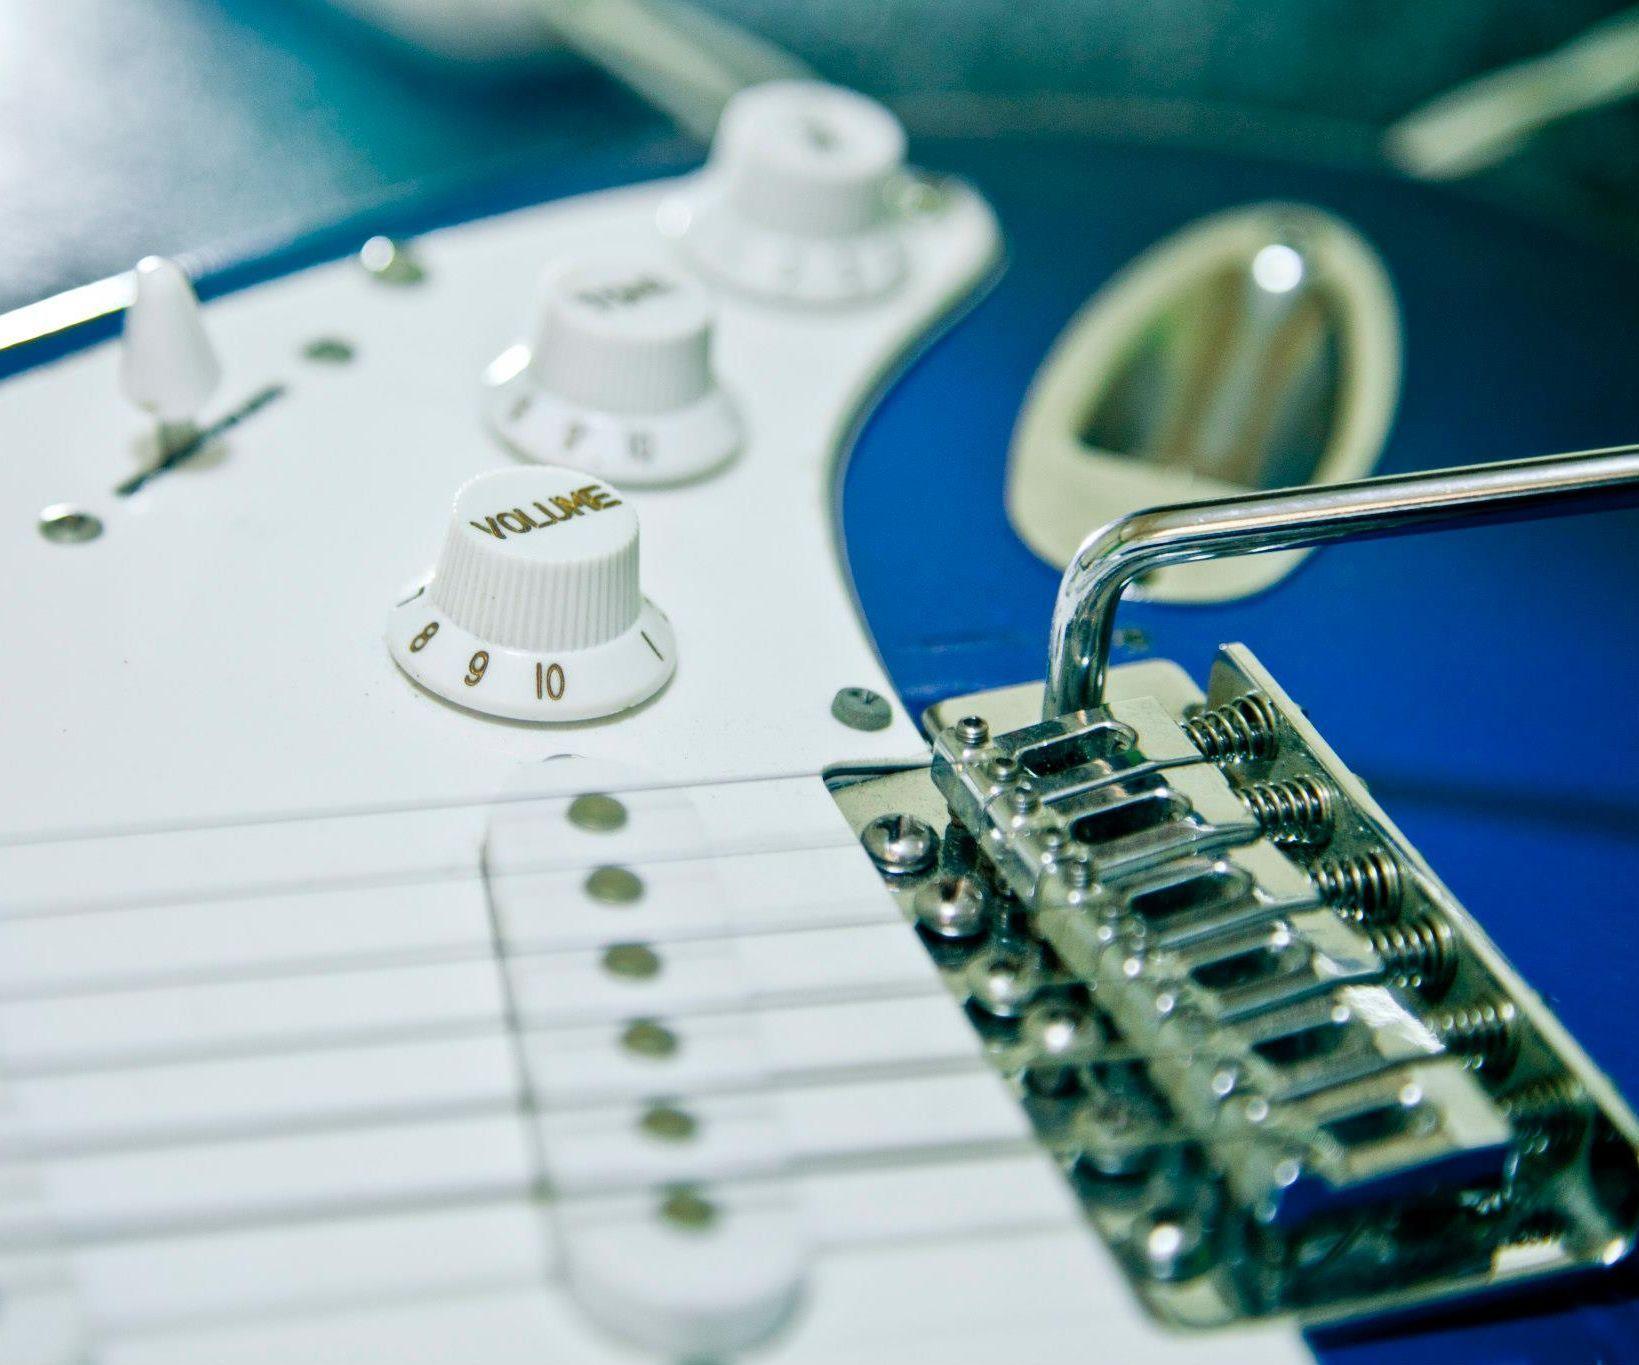 Electric Guitar from scratch